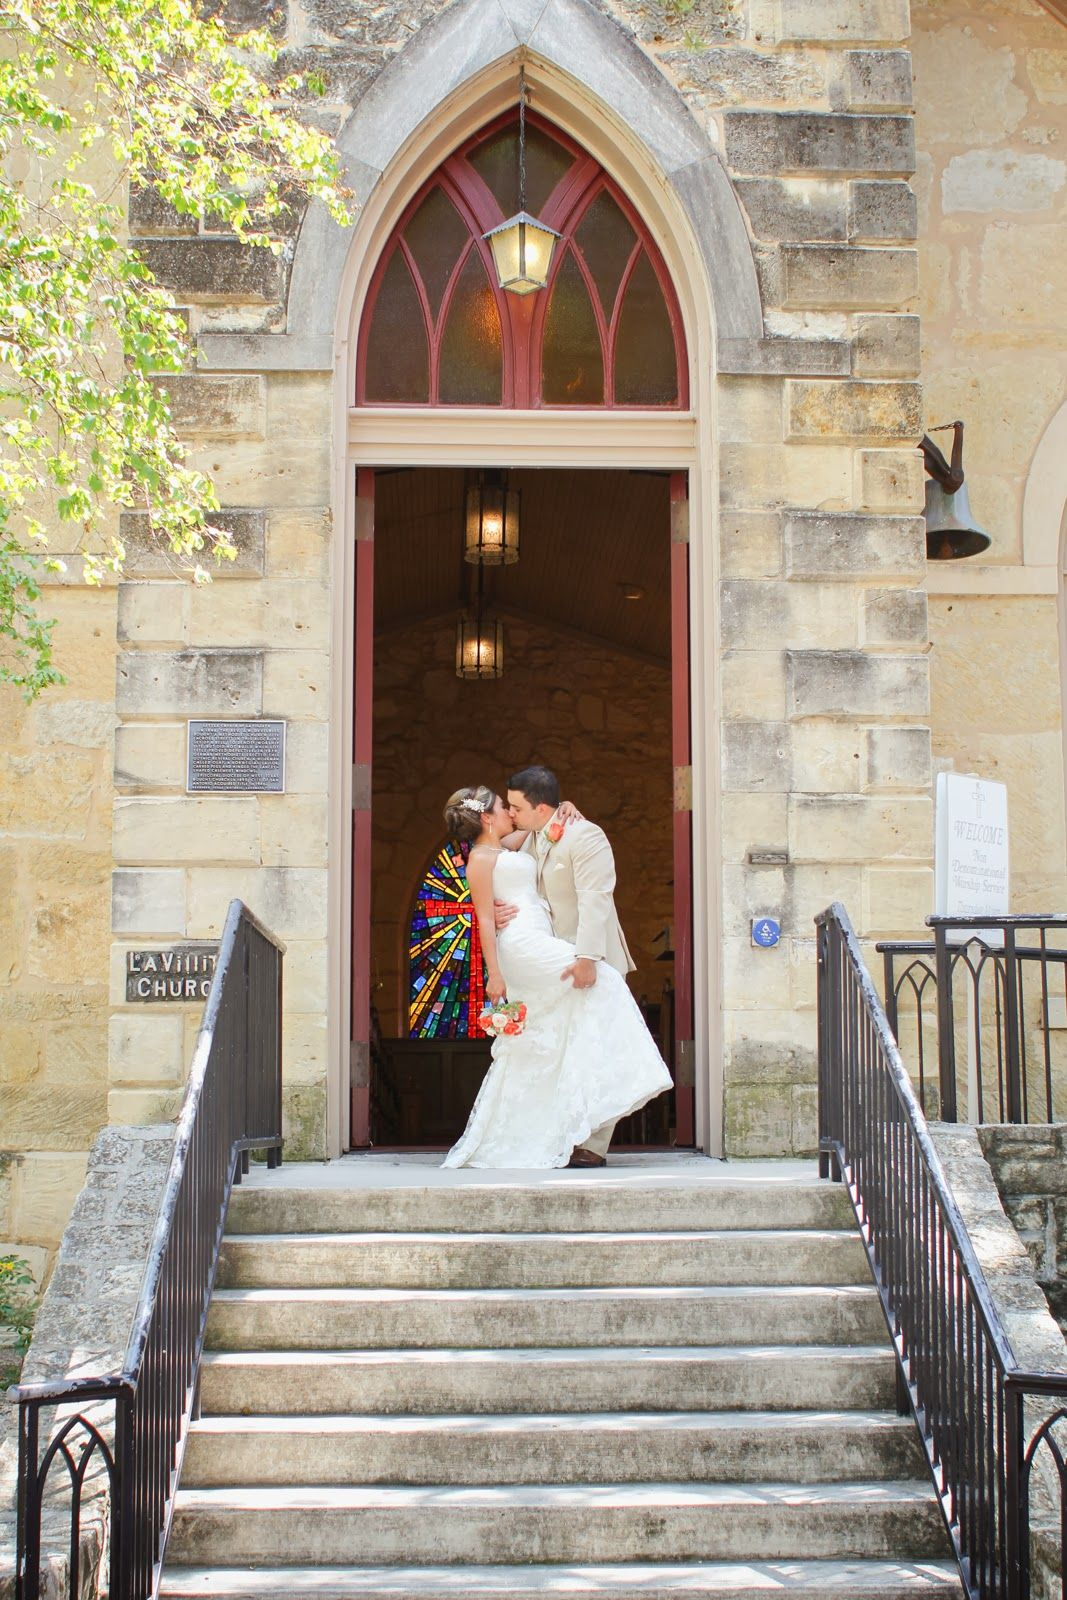 New Image Wedding Photography Kelly Zach S Little Church Of La Villita